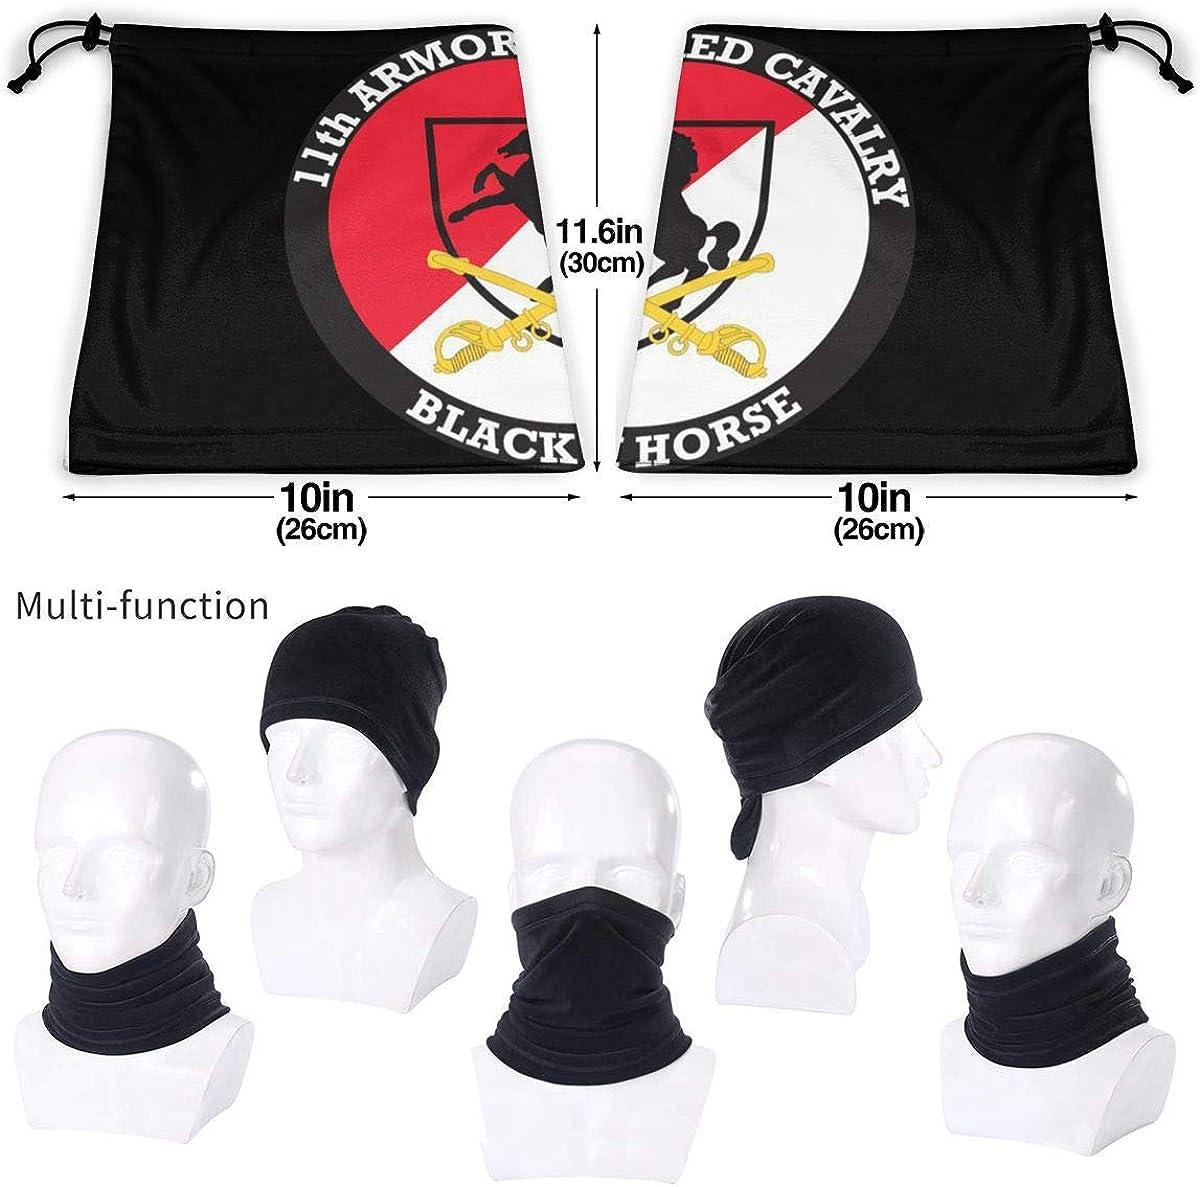 Unisex 11th Armored Cavalry Regiment Black Horse Neck Warmer Gaiter Windproof Ski Mask Face Shields Magic Scarf